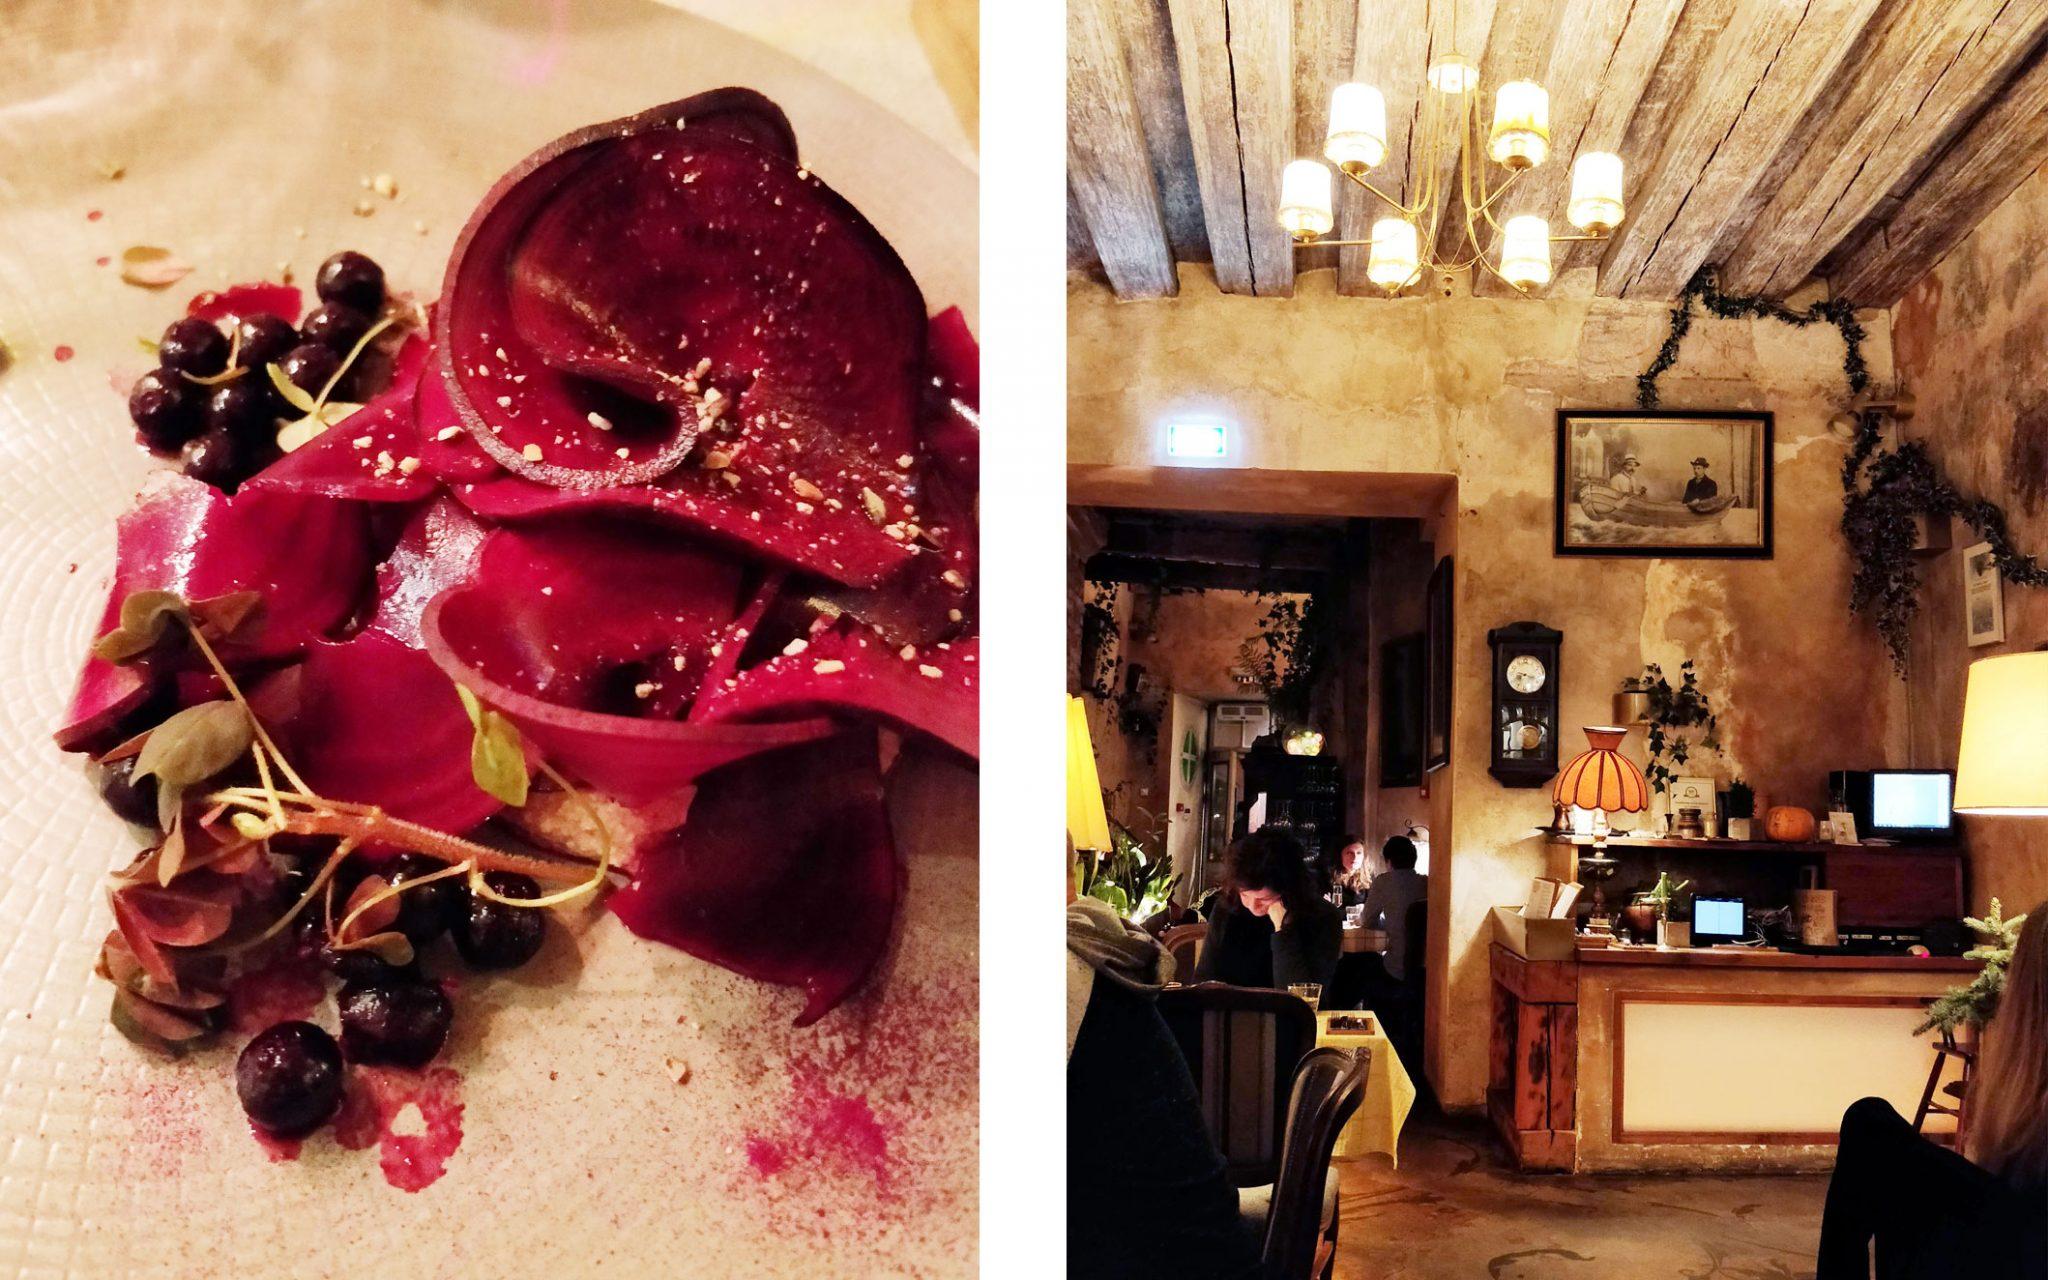 Von Krahl Aed ravintolan punajuuriannos ja ravintolasali